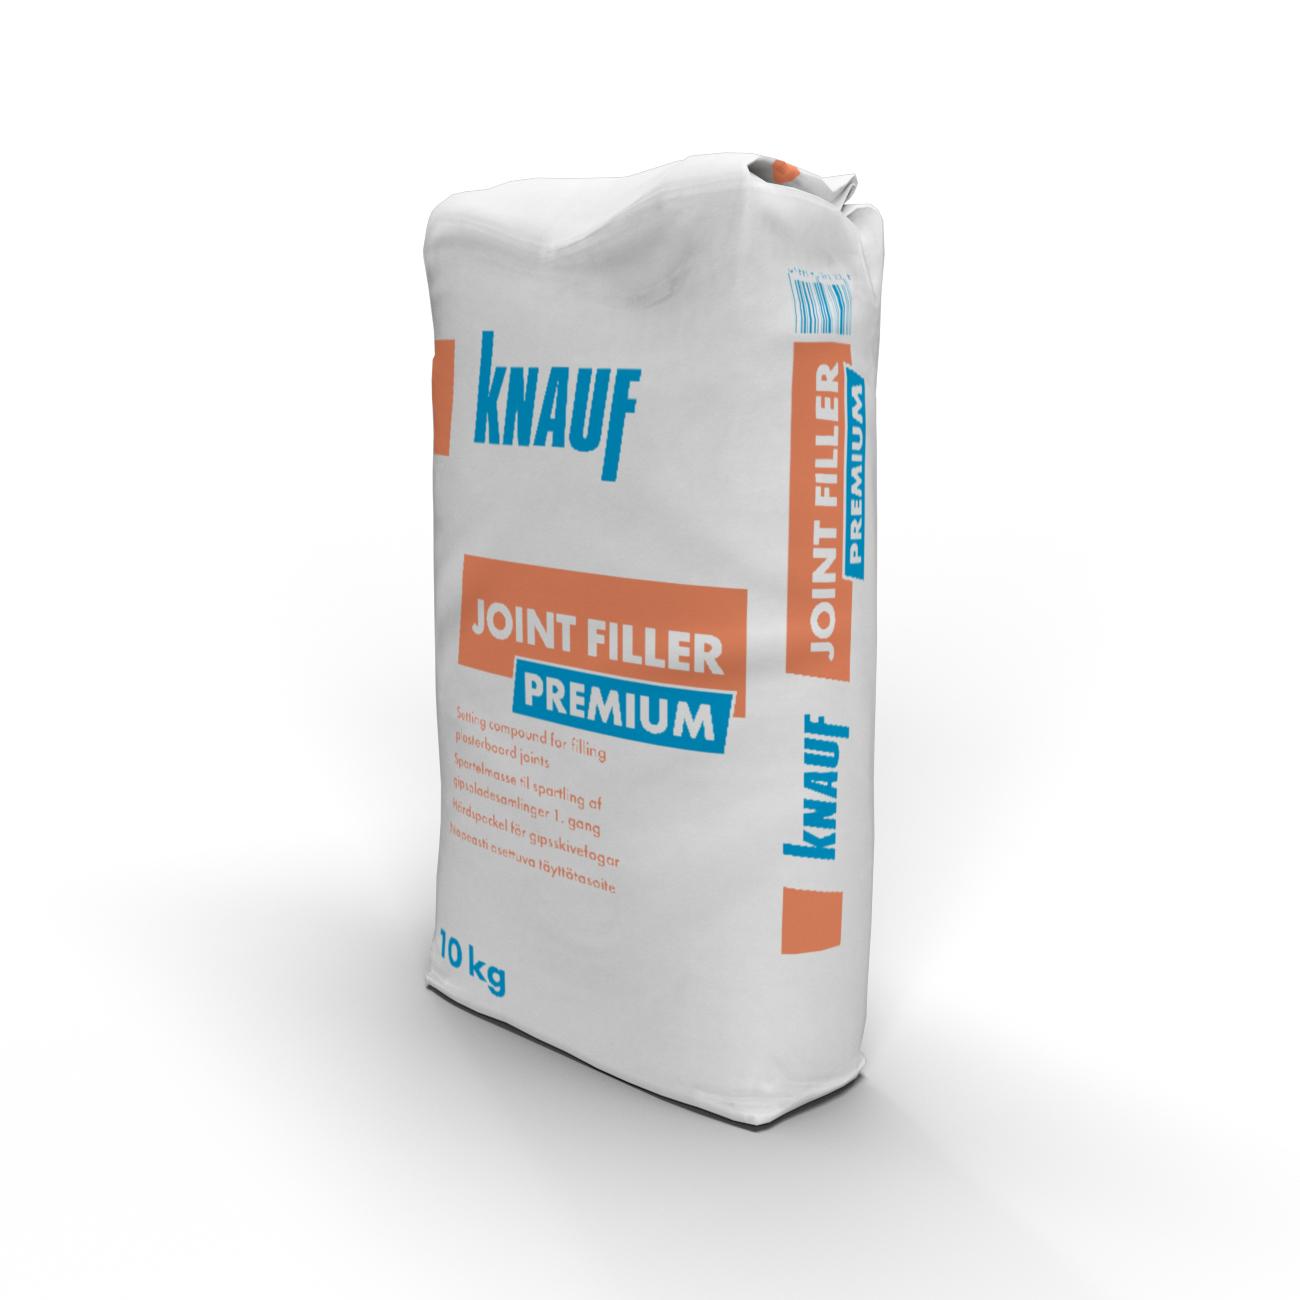 Joint Filler Premium